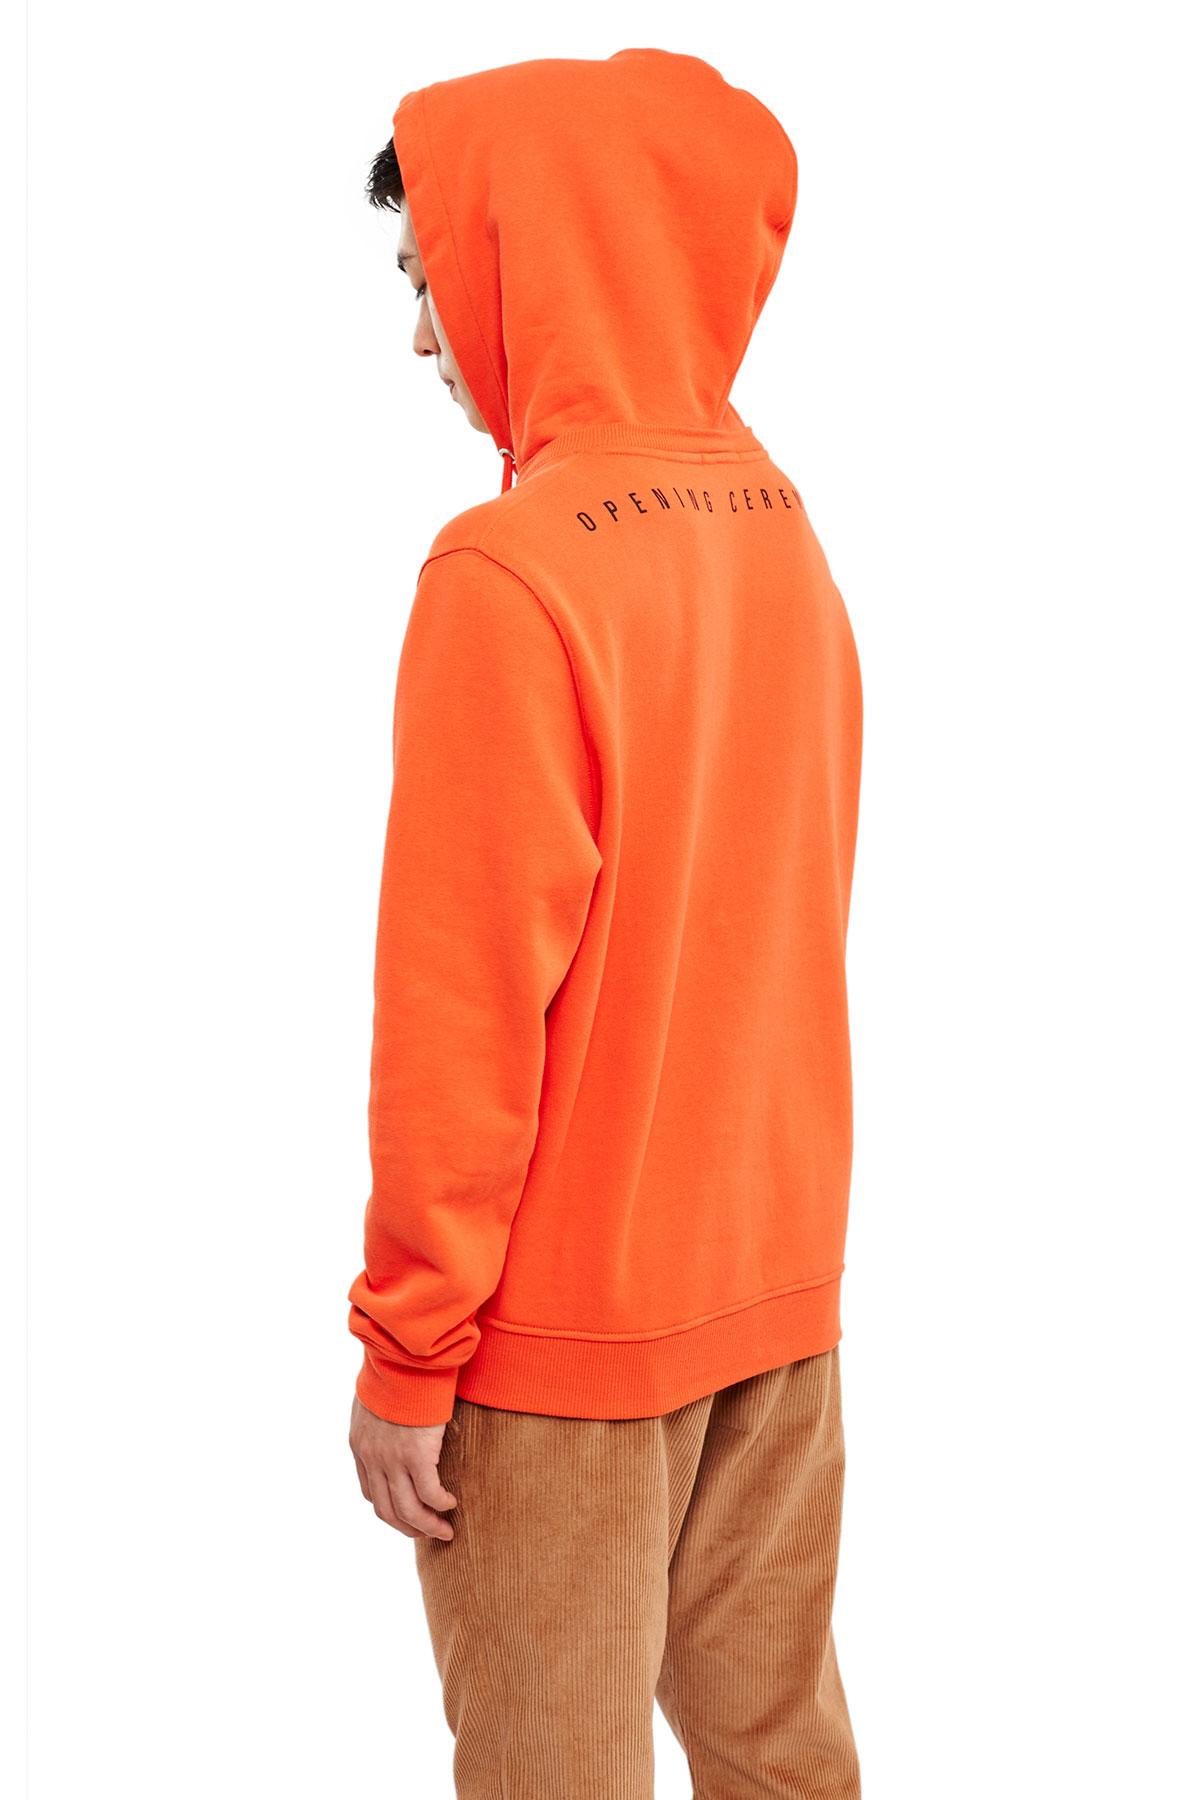 esprit-opening-ceremony-hoodie-3